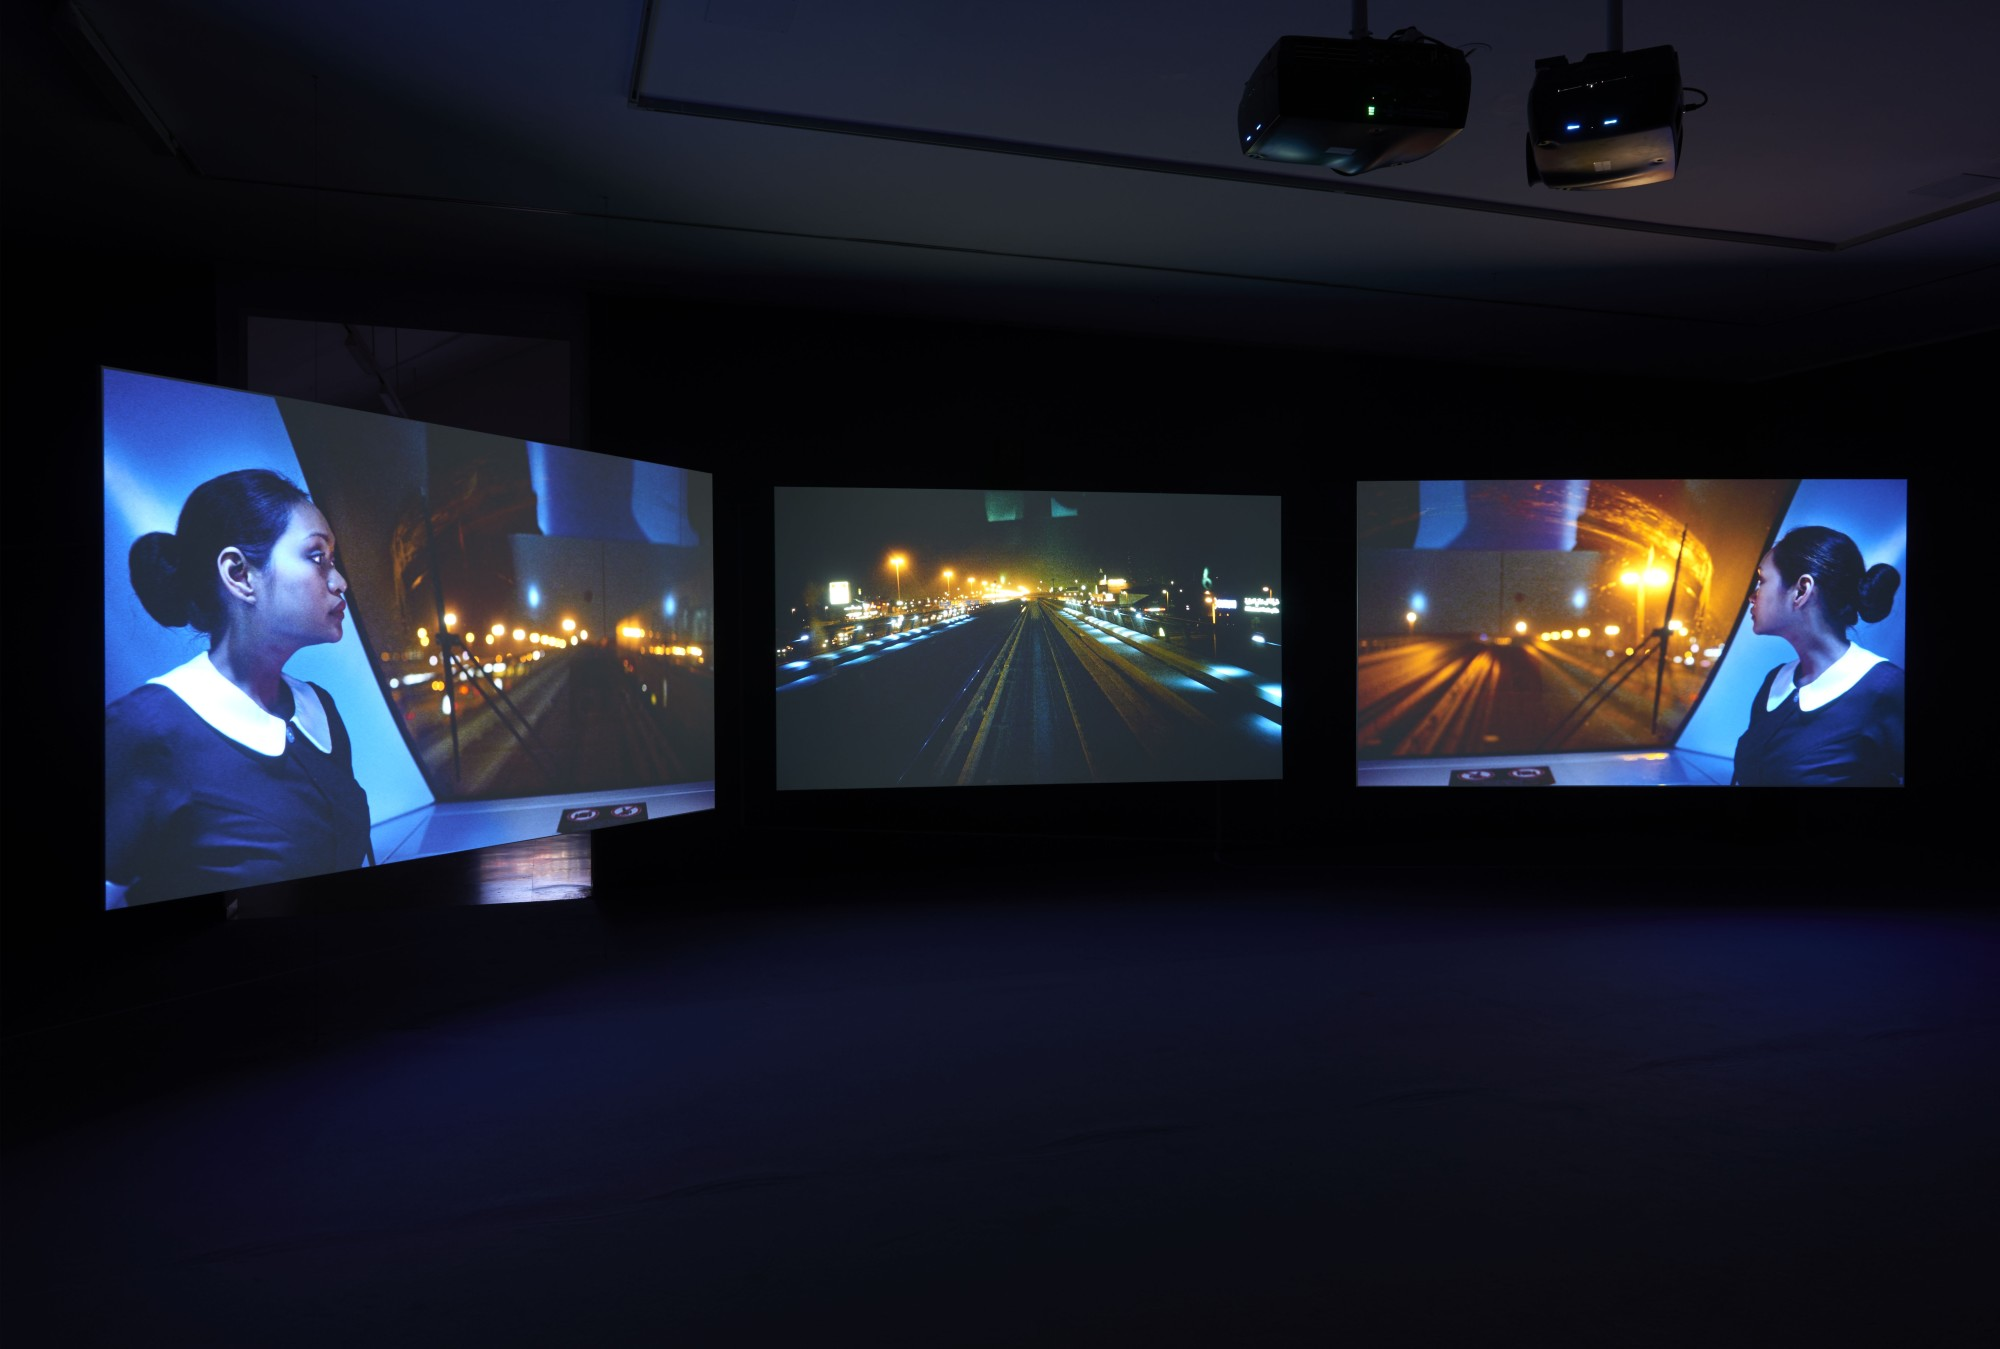 Playtime. Galería Helga de Alvear, Madrid, 2015  Three screen high definition video installation with 5.1 surround sound  64'12''